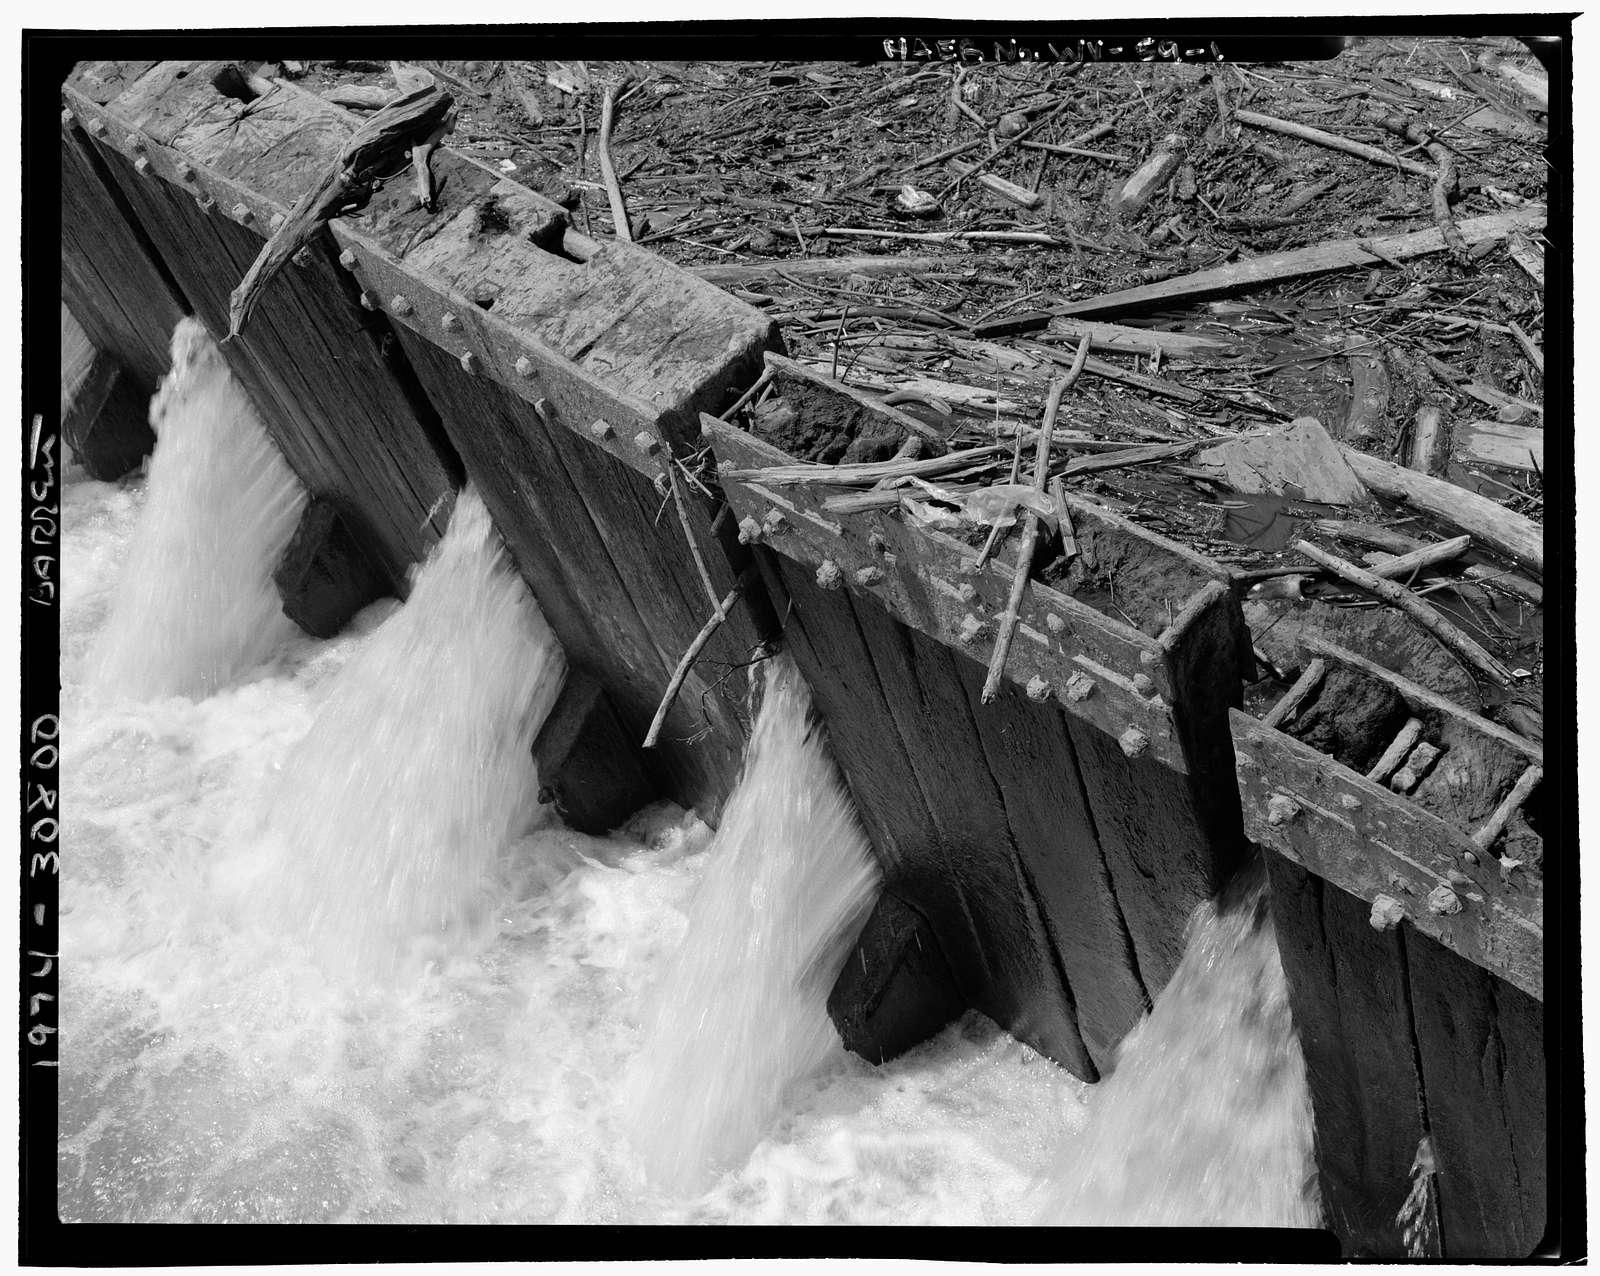 Ohio River Lock & Dam No. 12, Wheeling, Ohio County, WV